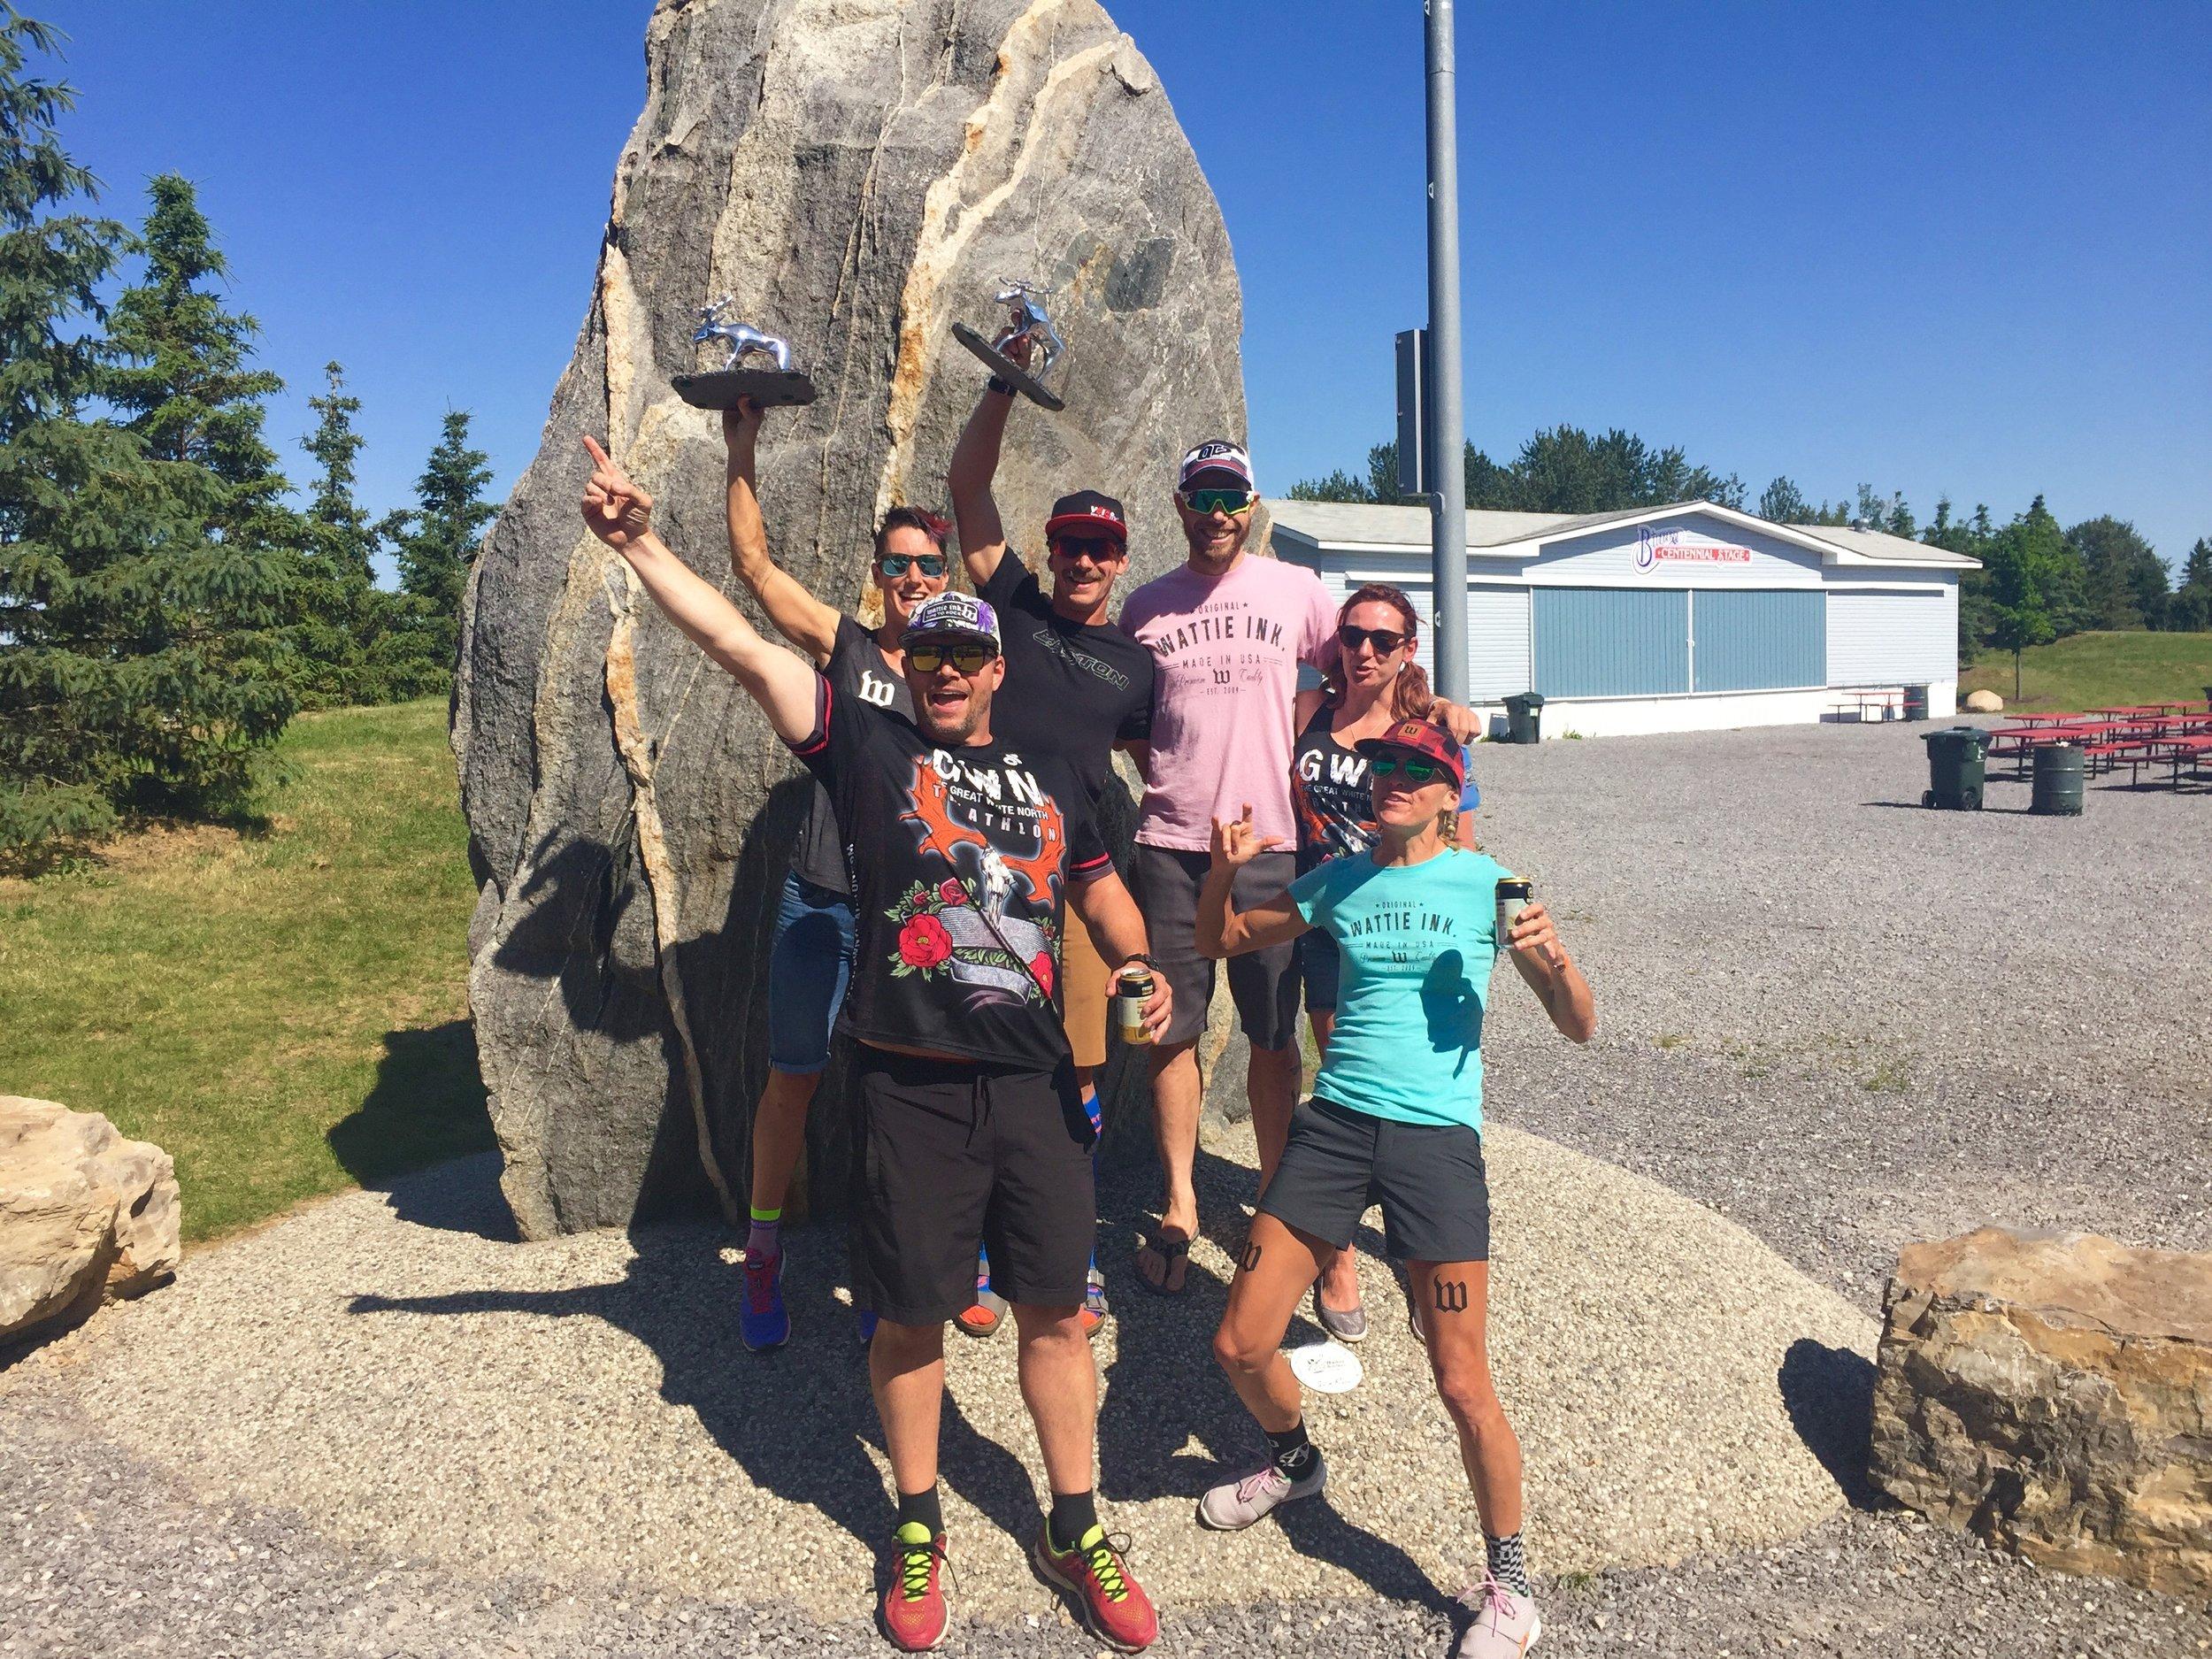 Mike, Bagg, VT, Rachel McBride, Nathan Killam, and Jenny Ayers aprés race